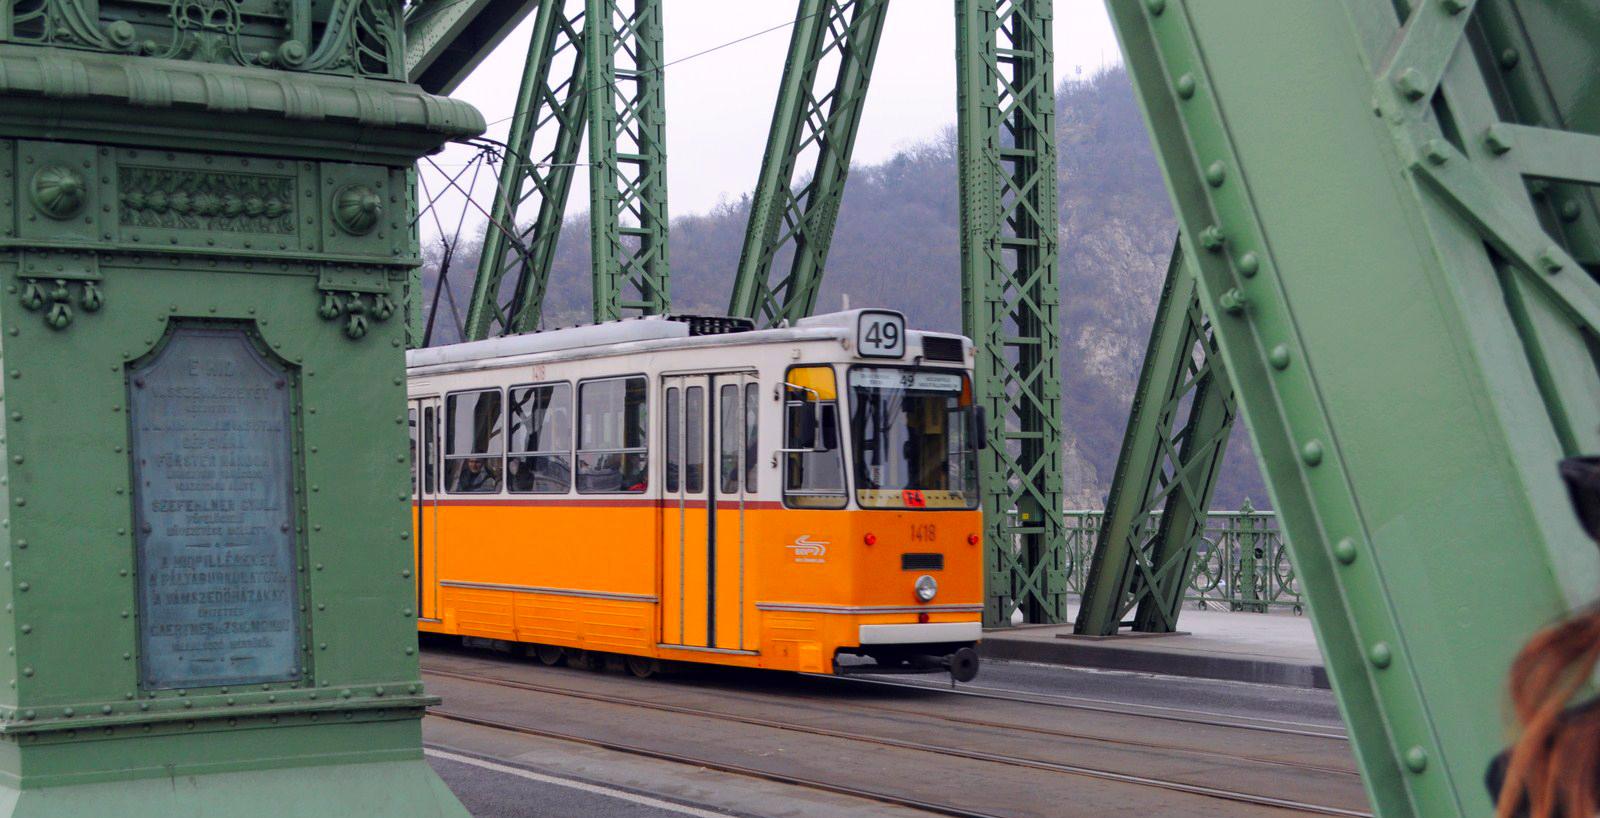 Qué ver en Budapest en un fin de semana: Tranvía cruzando el Danubio budapest en un fin de semana - 21411362632 2c984146f0 o - Qué ver en Budapest en un fin de semana